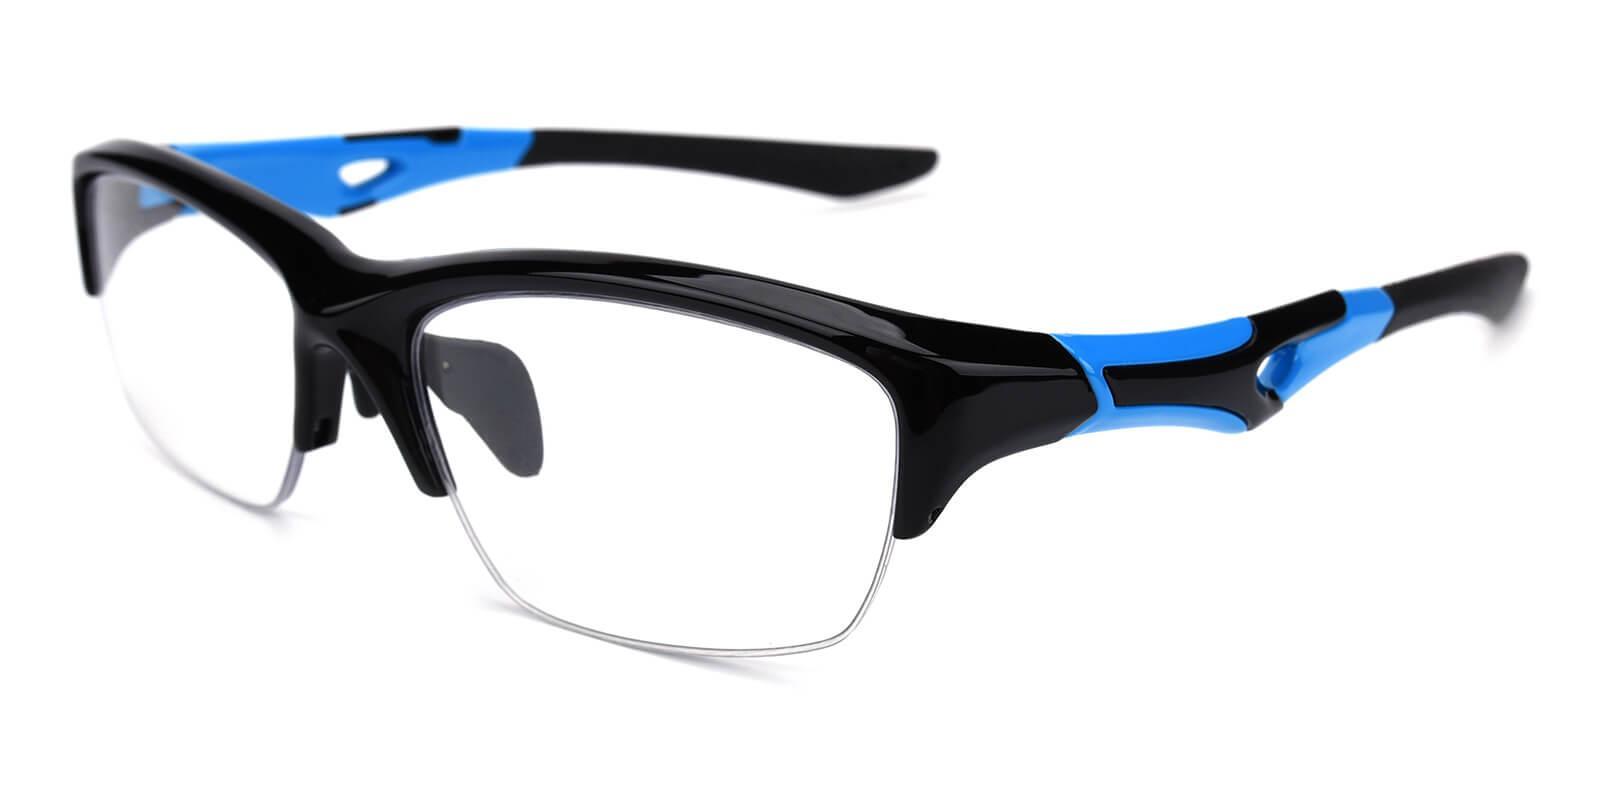 Philips-Blue-Rectangle-TR-SportsGlasses-additional1